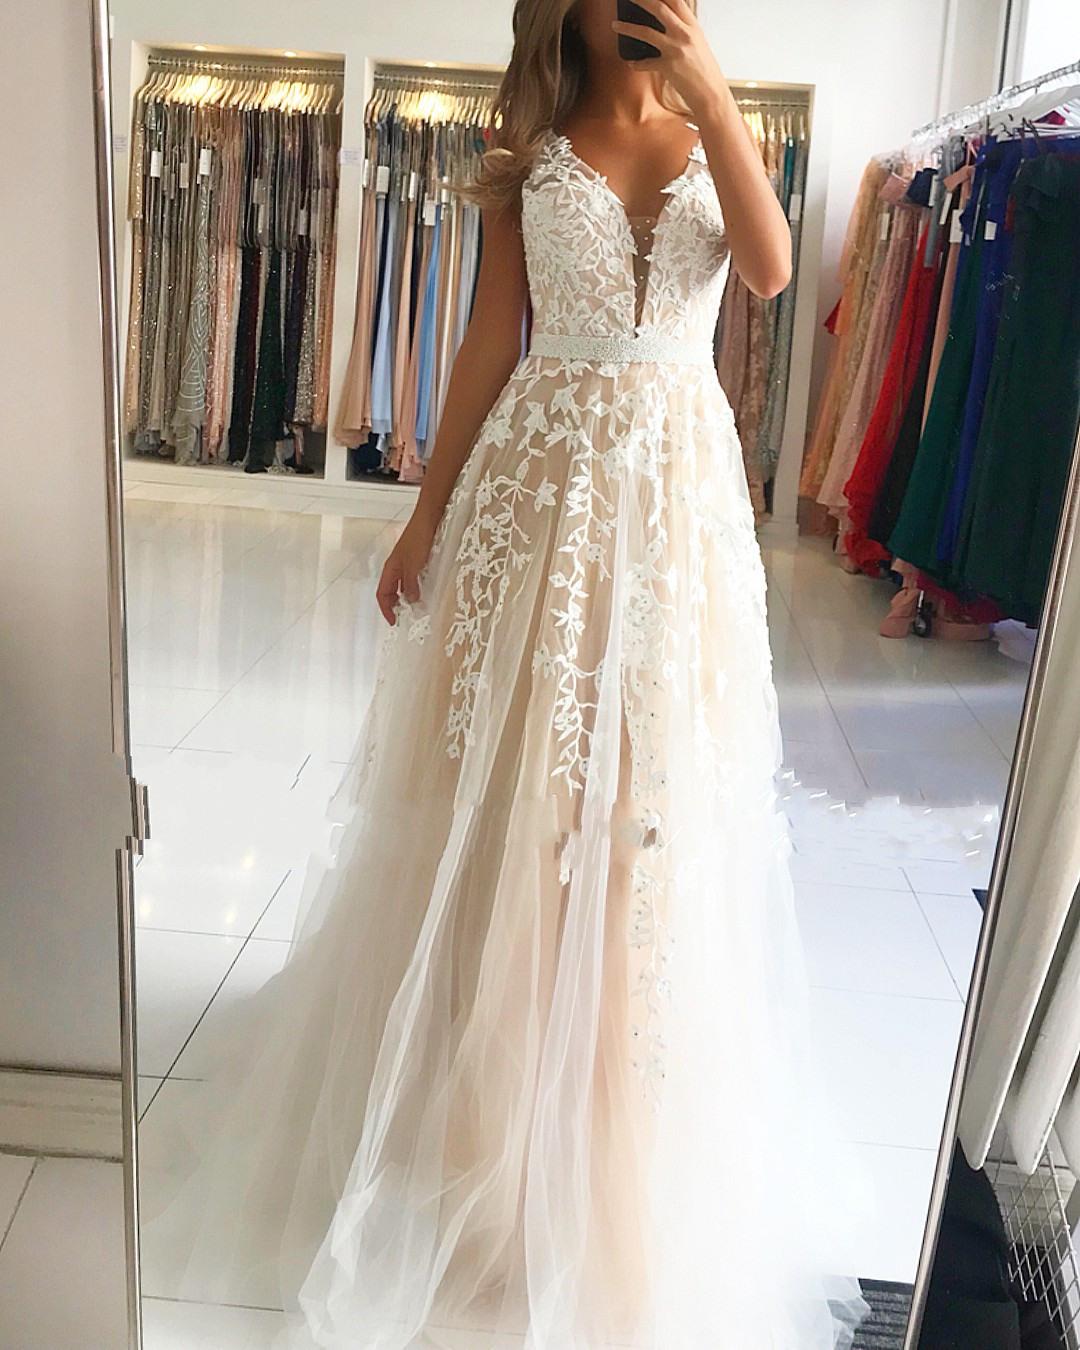 13 Perfekt Abend Kleid Elegant Lang GalerieFormal Spektakulär Abend Kleid Elegant Lang Vertrieb